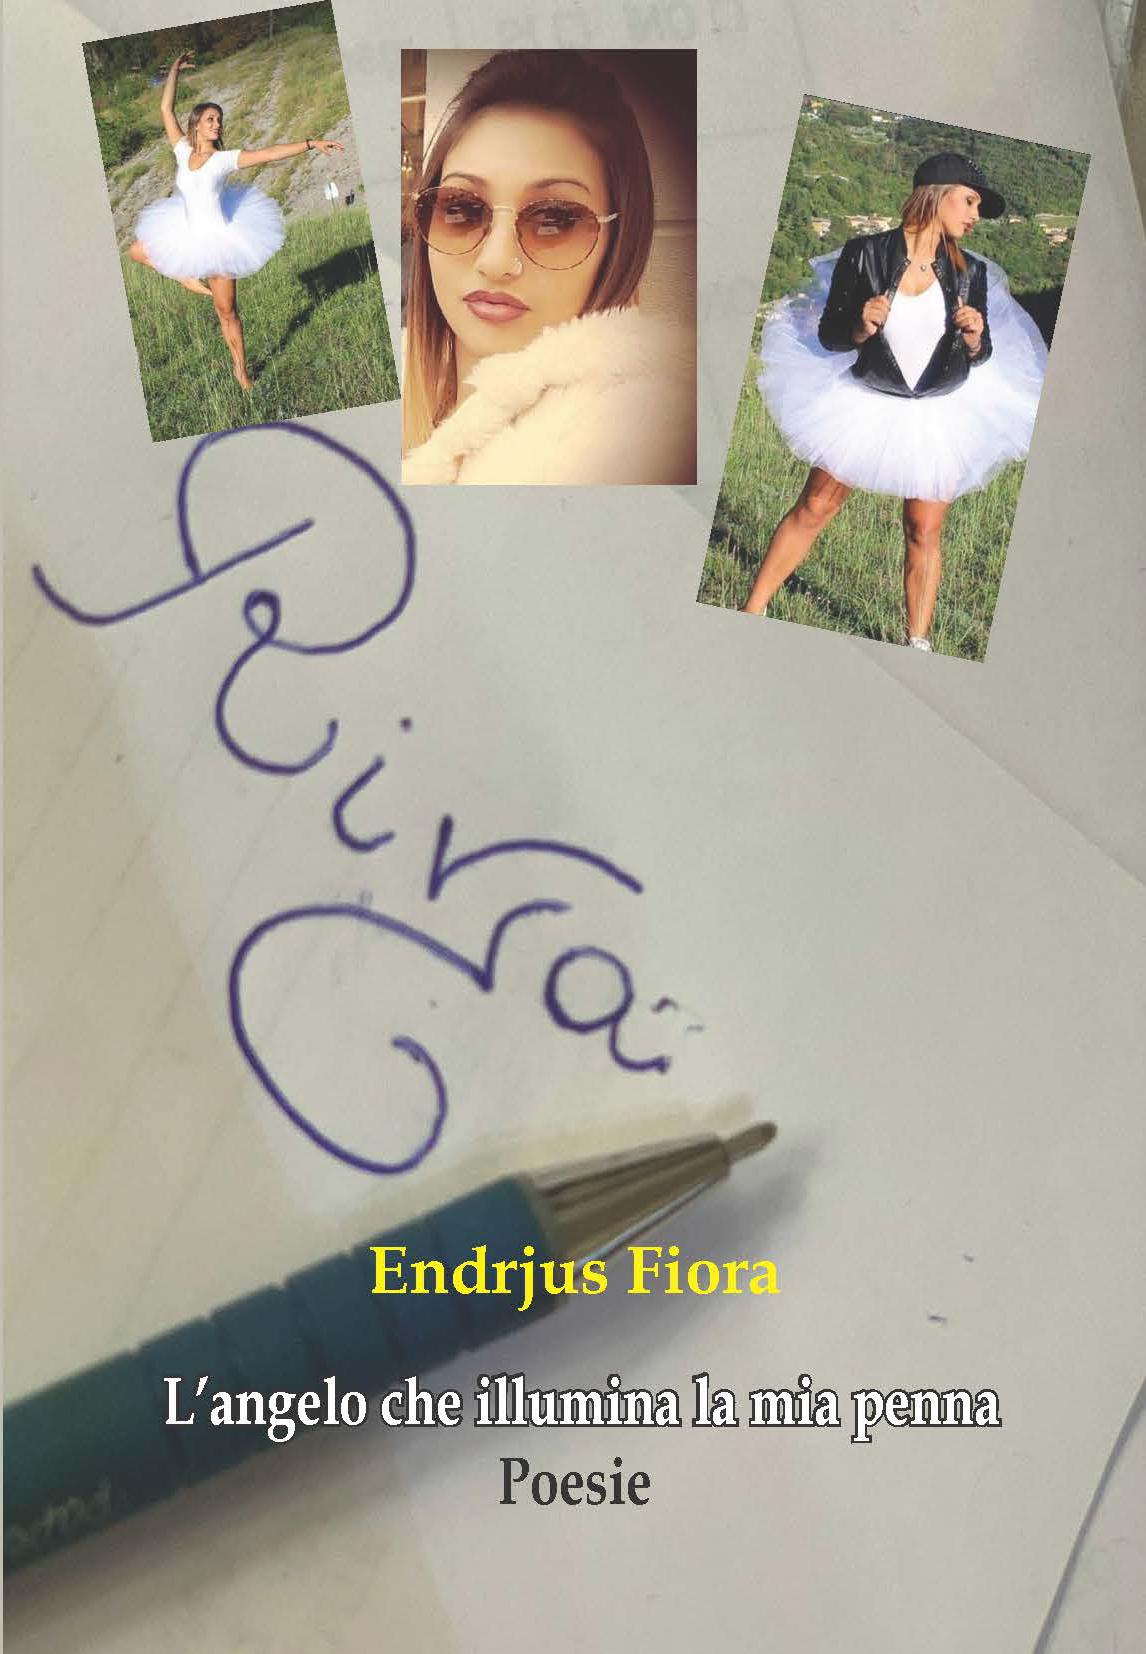 L'angelo che illumina la mia penna – Poesie